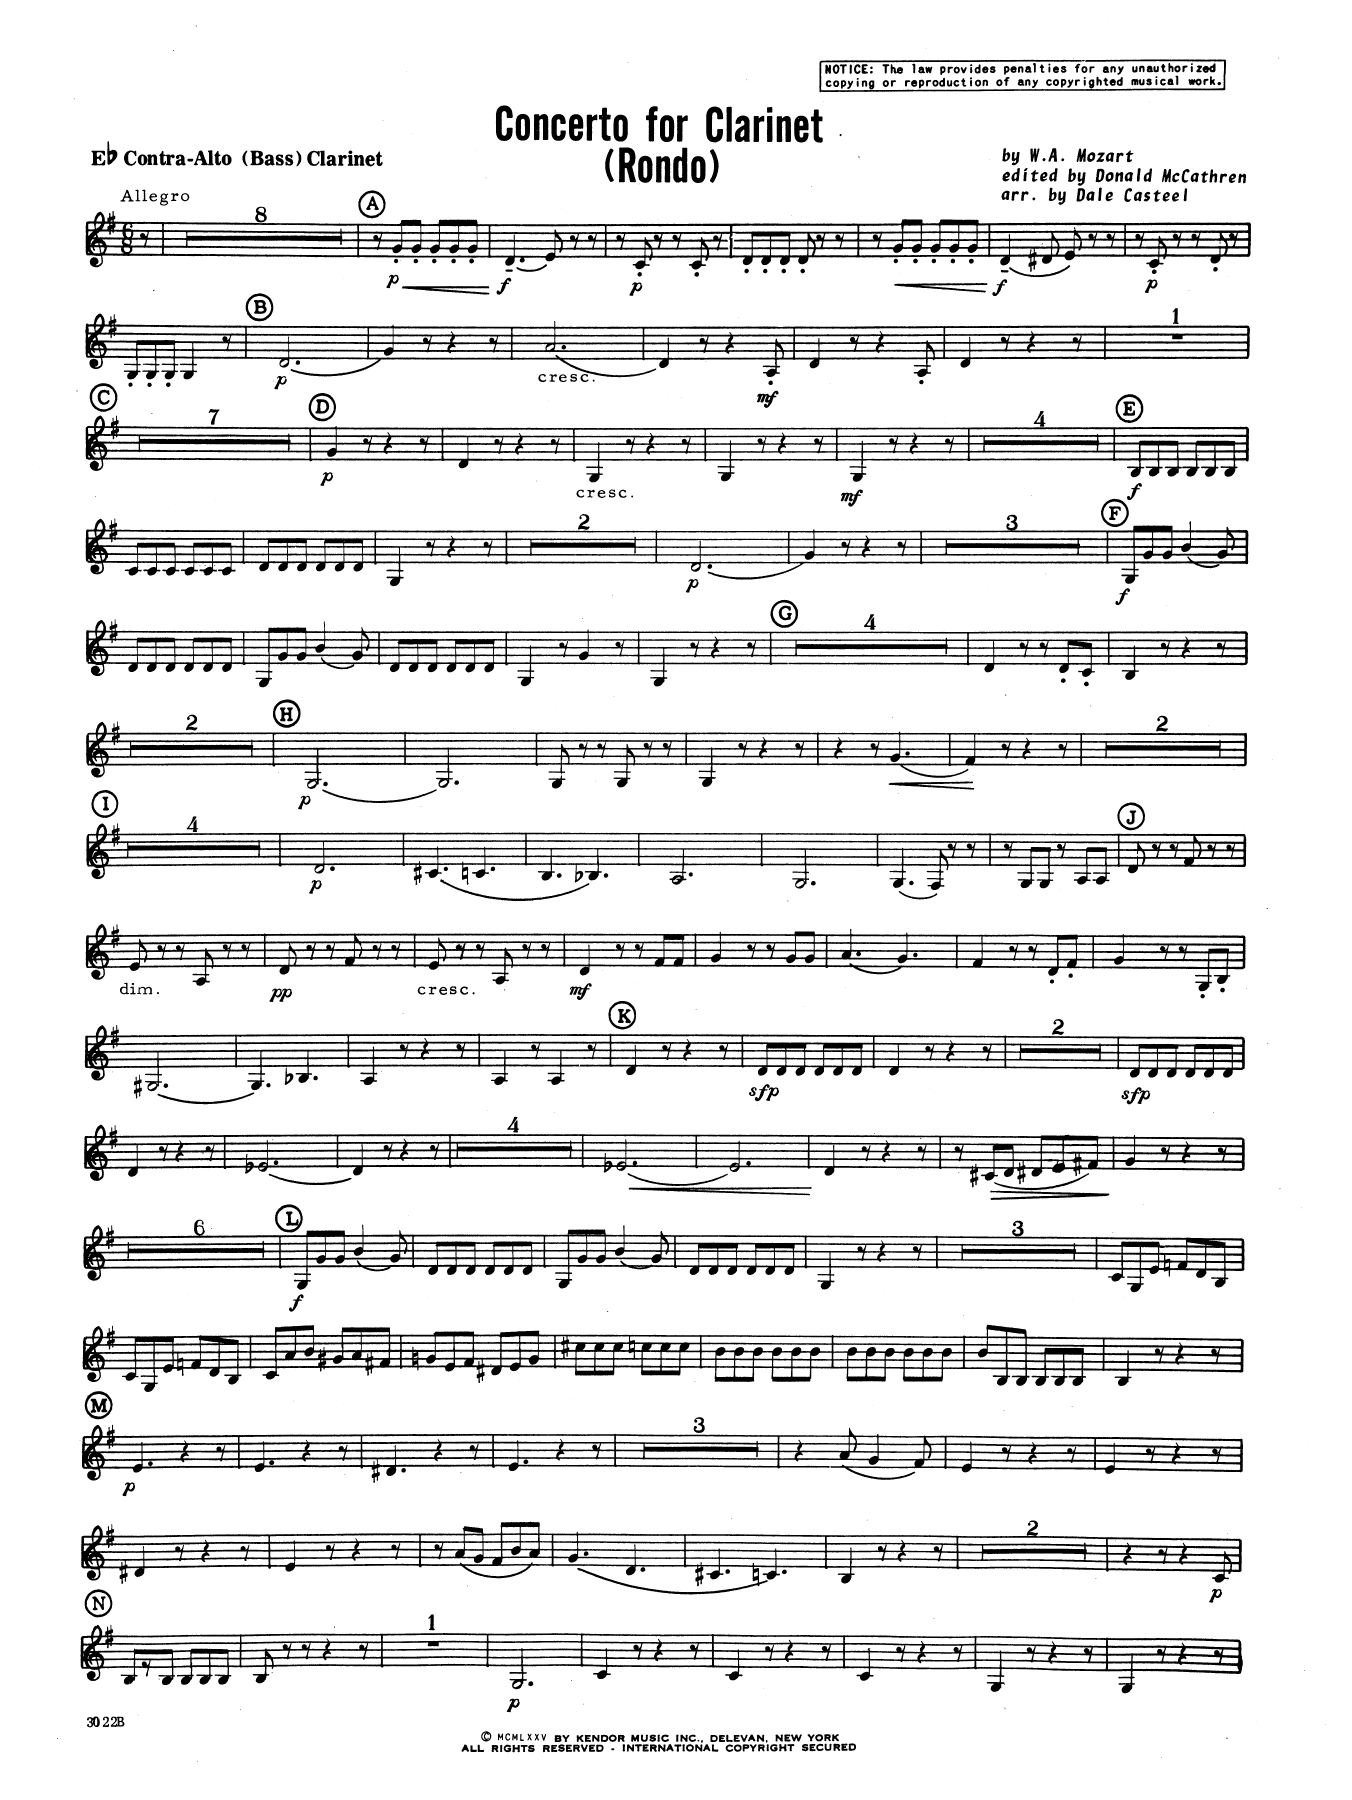 Donald McCathren and Dale Casteel Concerto For Clarinet - Rondo (3rd Movement) - K.622 - Eb Contra Alto Clarinet sheet music notes printable PDF score